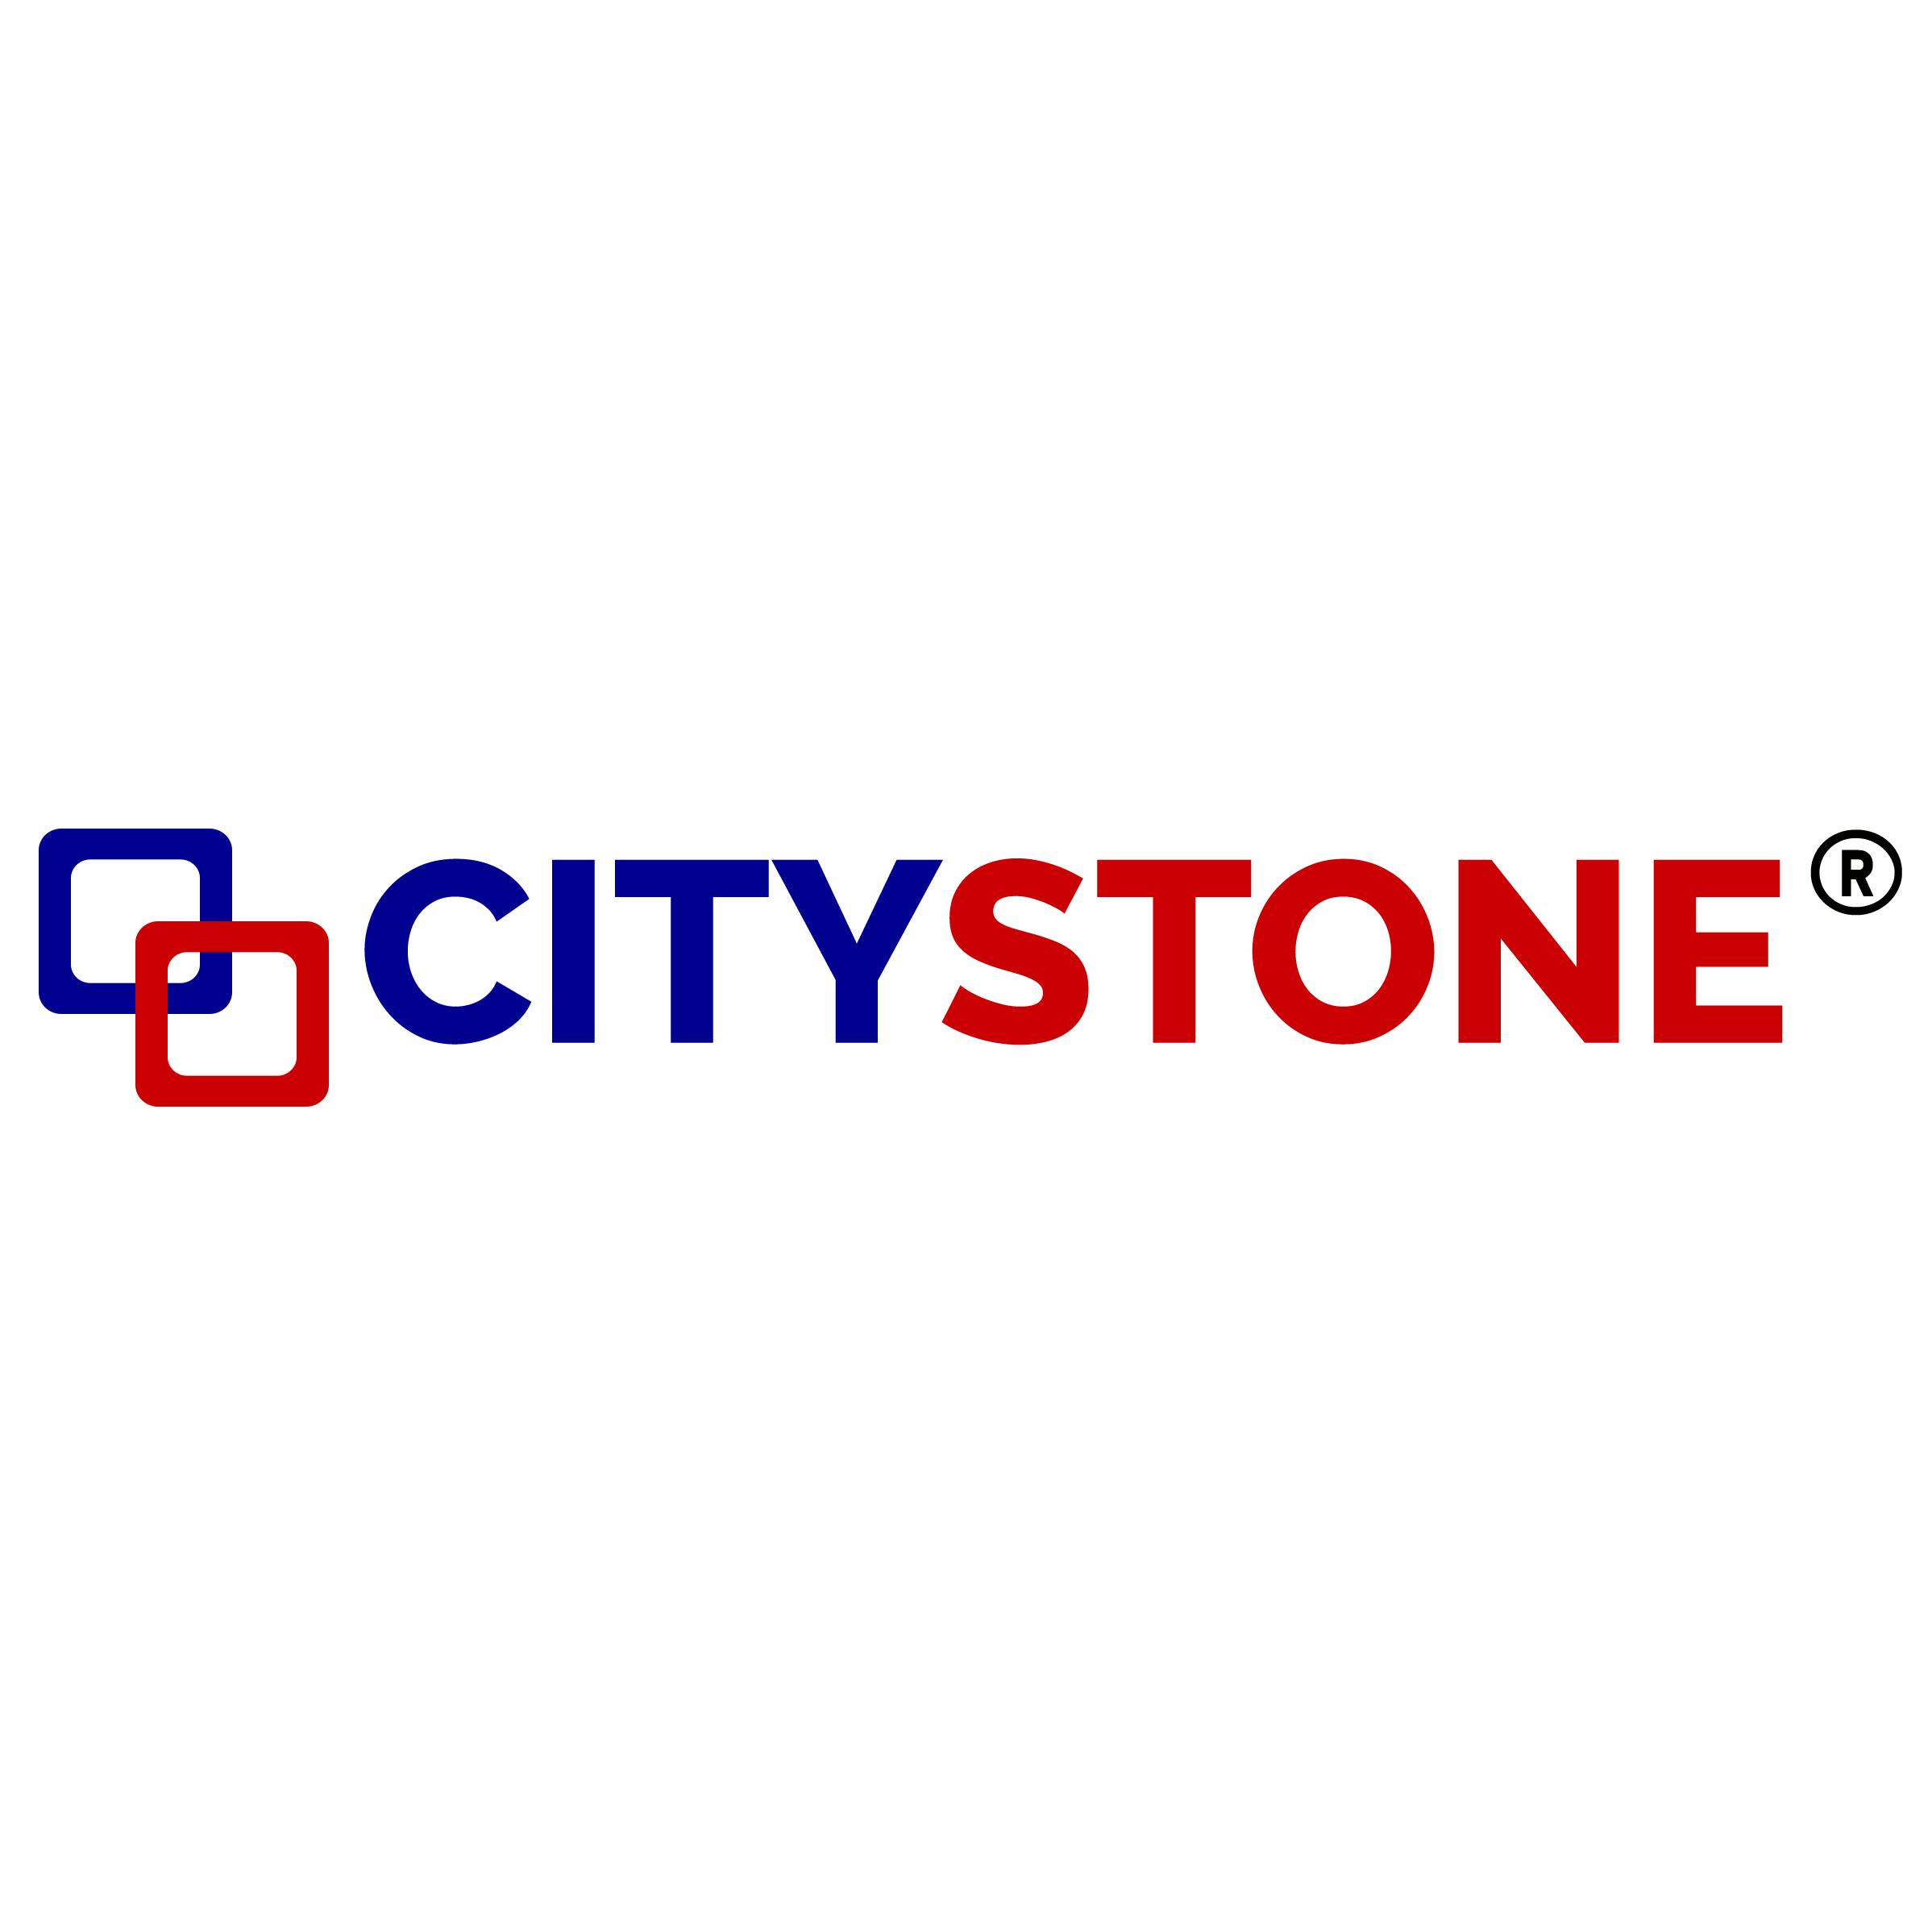 CITYSTONE - Brick Pavers & Cultured Stone - Brick Pavers Installers, Pavers Driveways - Patios Logo